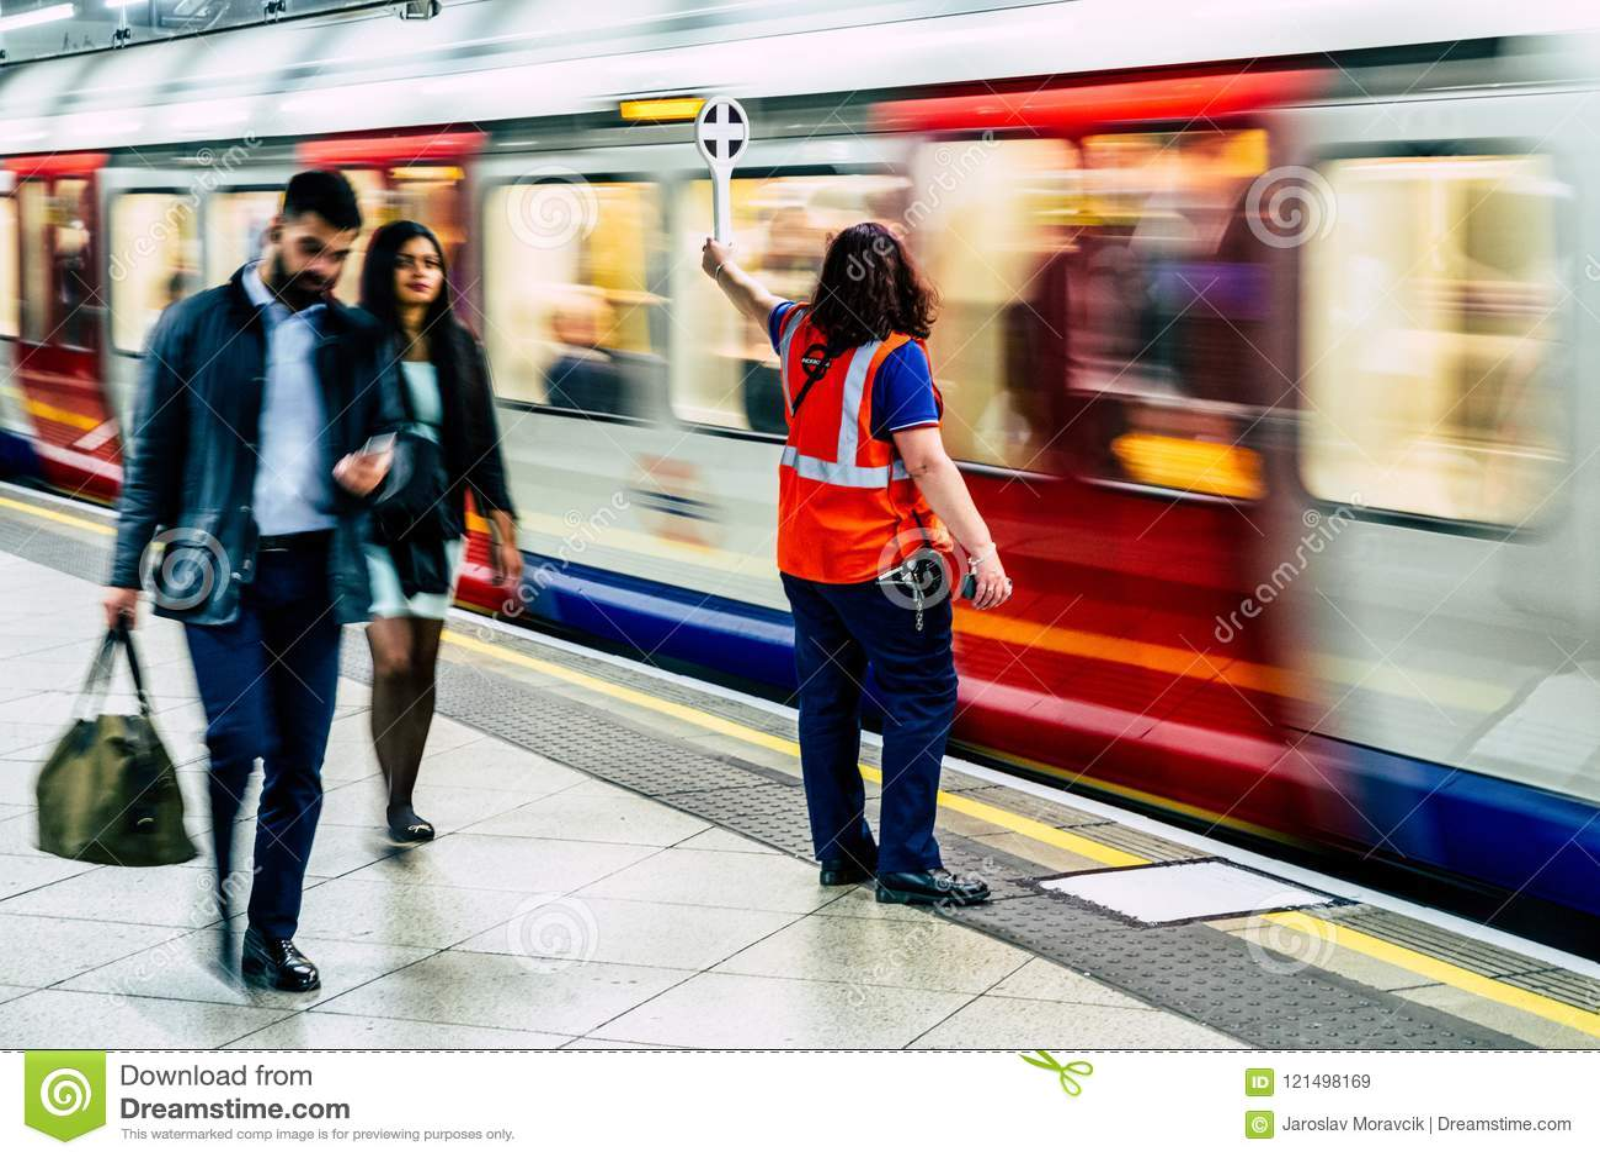 Dispatcher in London subway